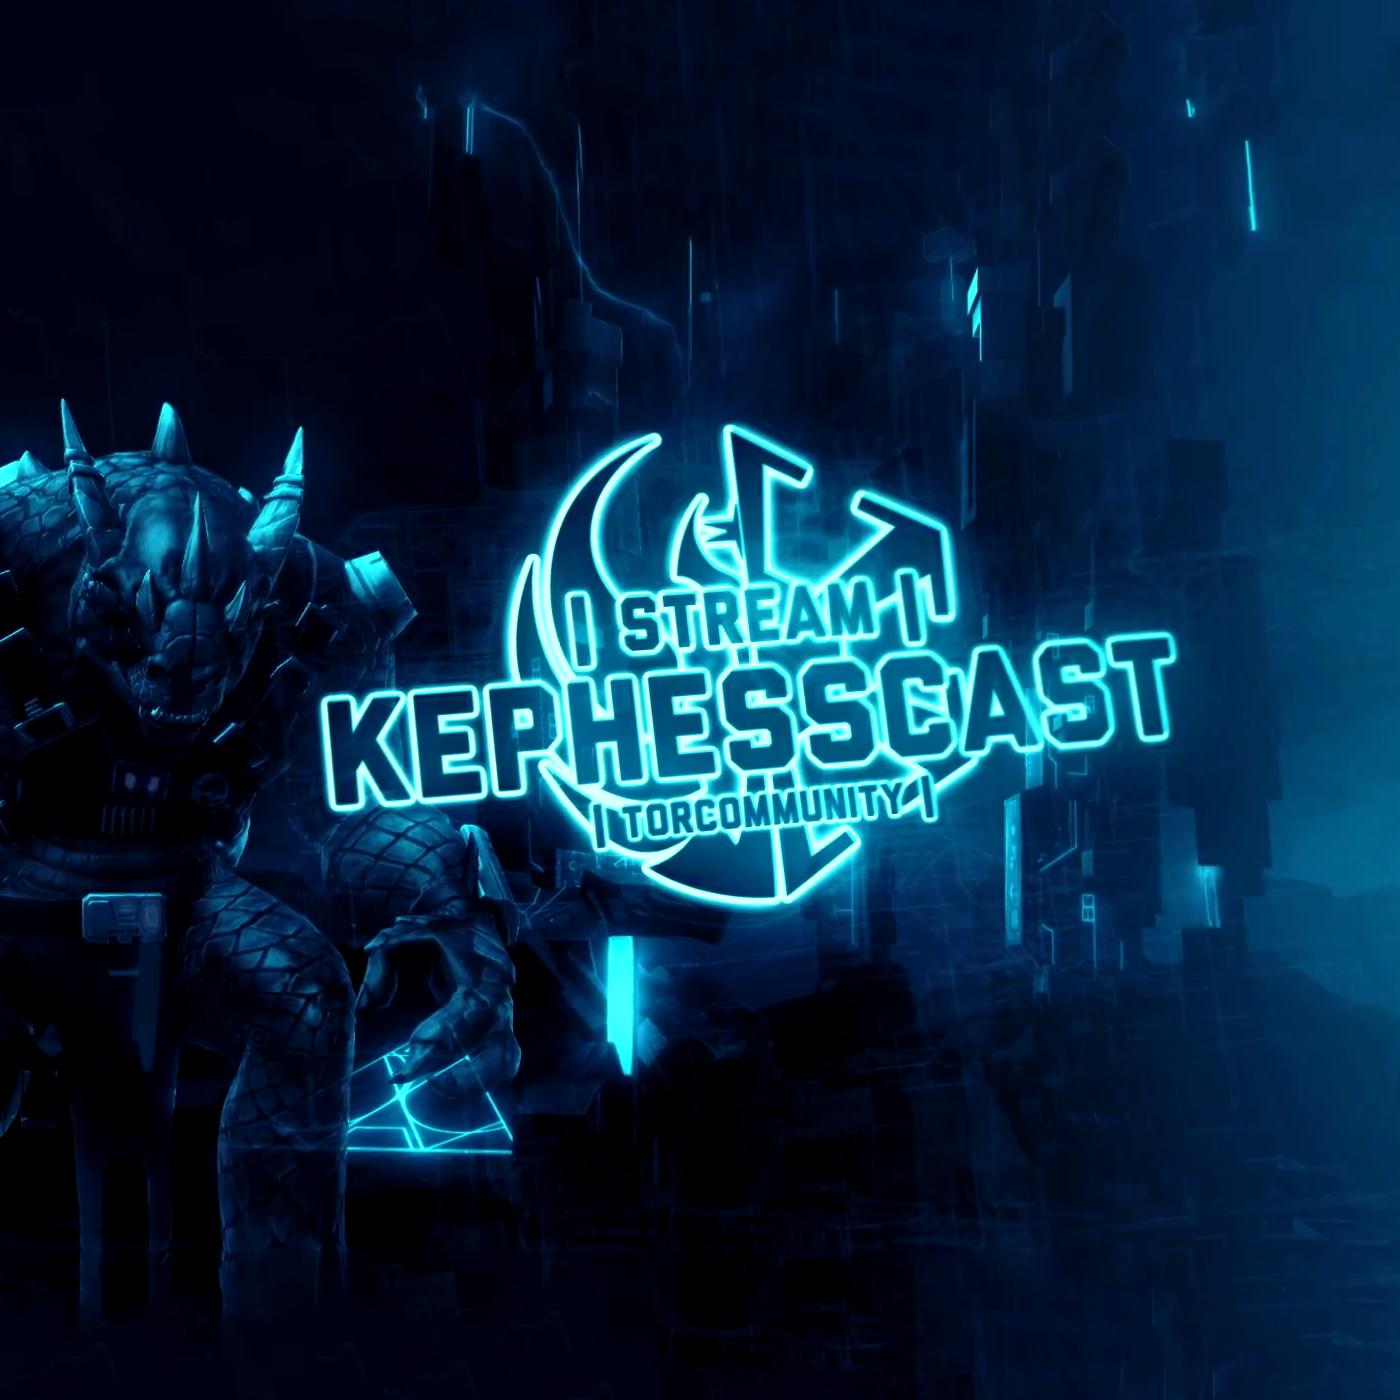 KephessCast